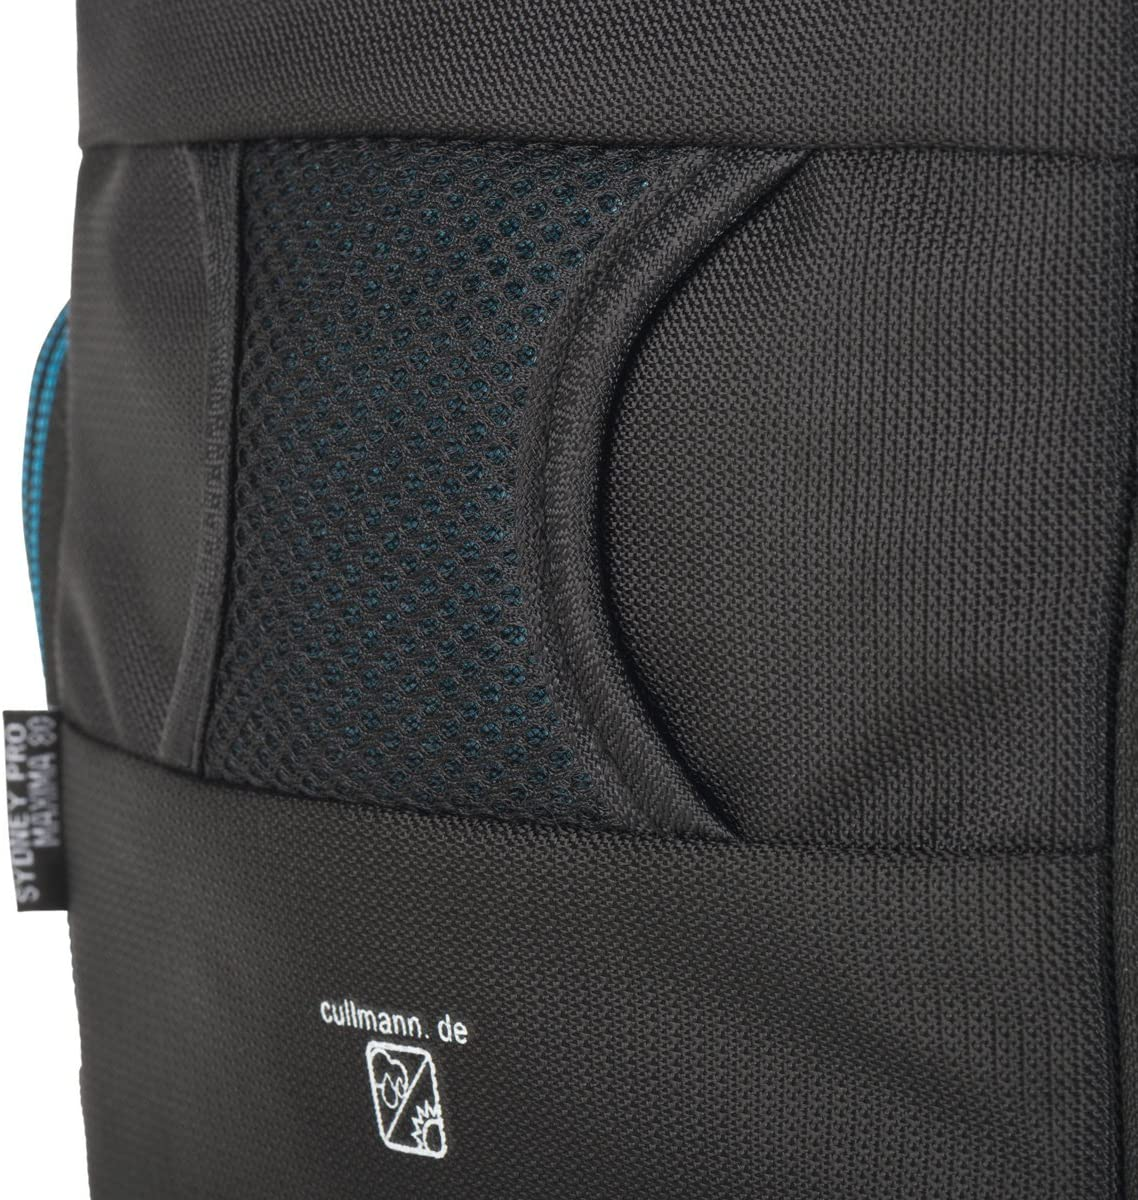 Cullmann 97520 Sydney Pro Maxima 80 Camera Case Black